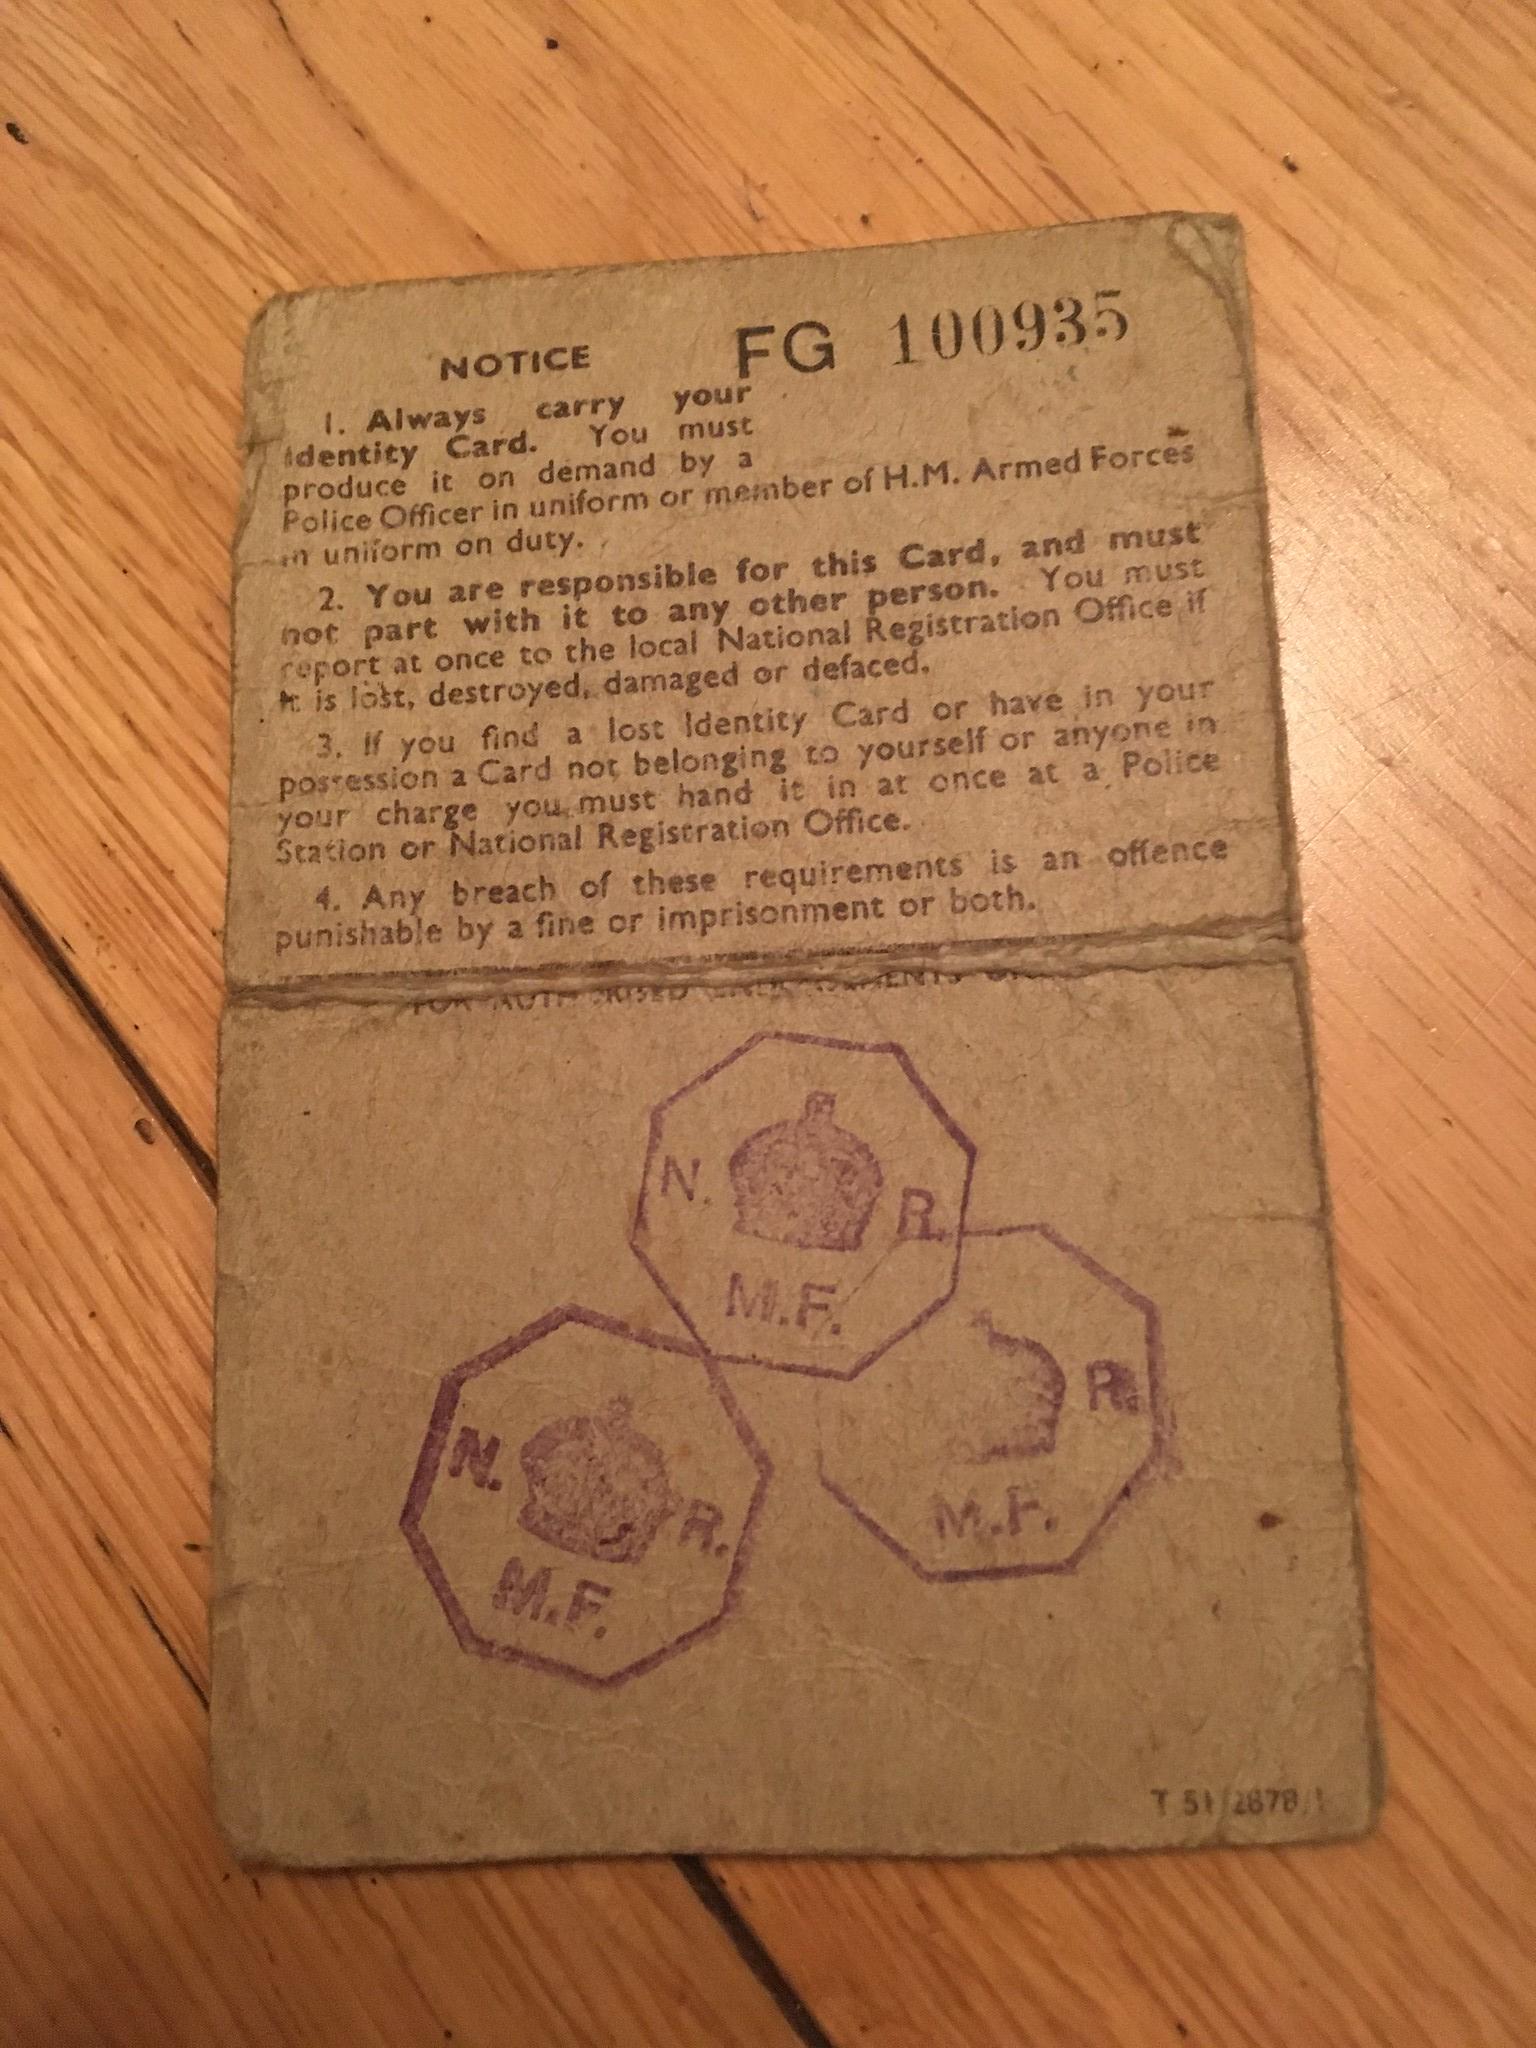 identity card 1943 britain